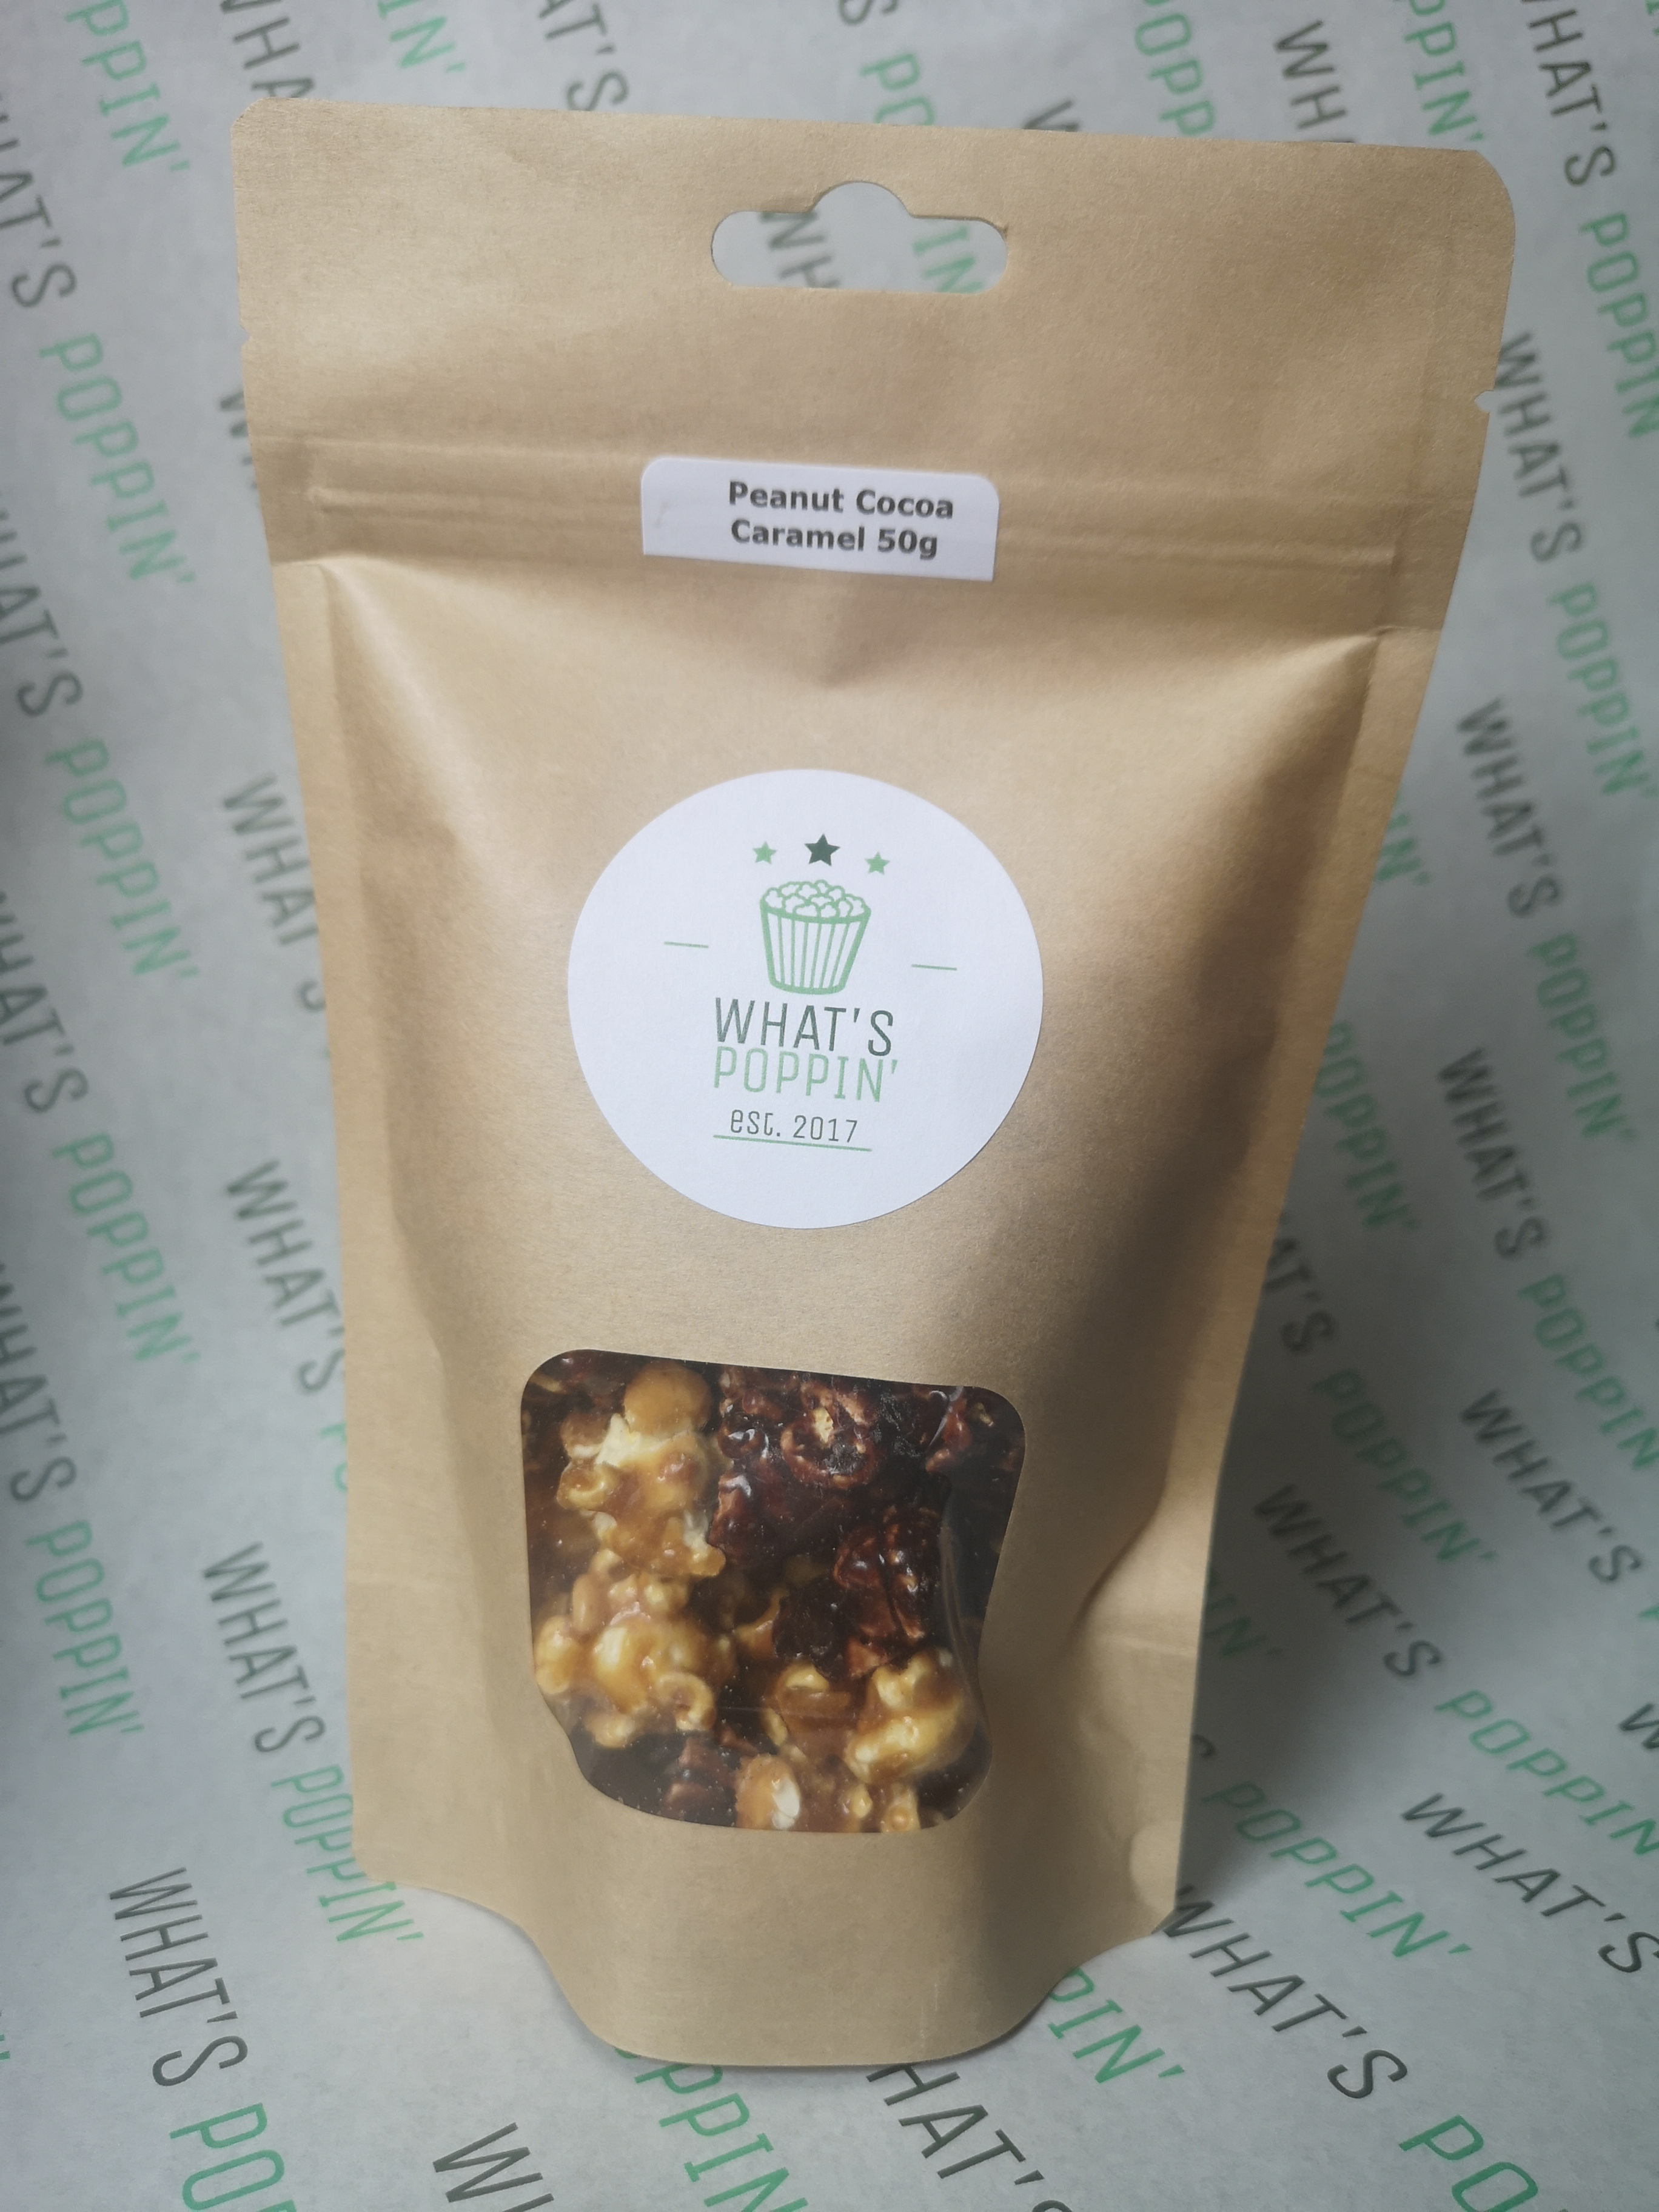 LIMITED EDITION! Peanut Brittle Cocoa Mix